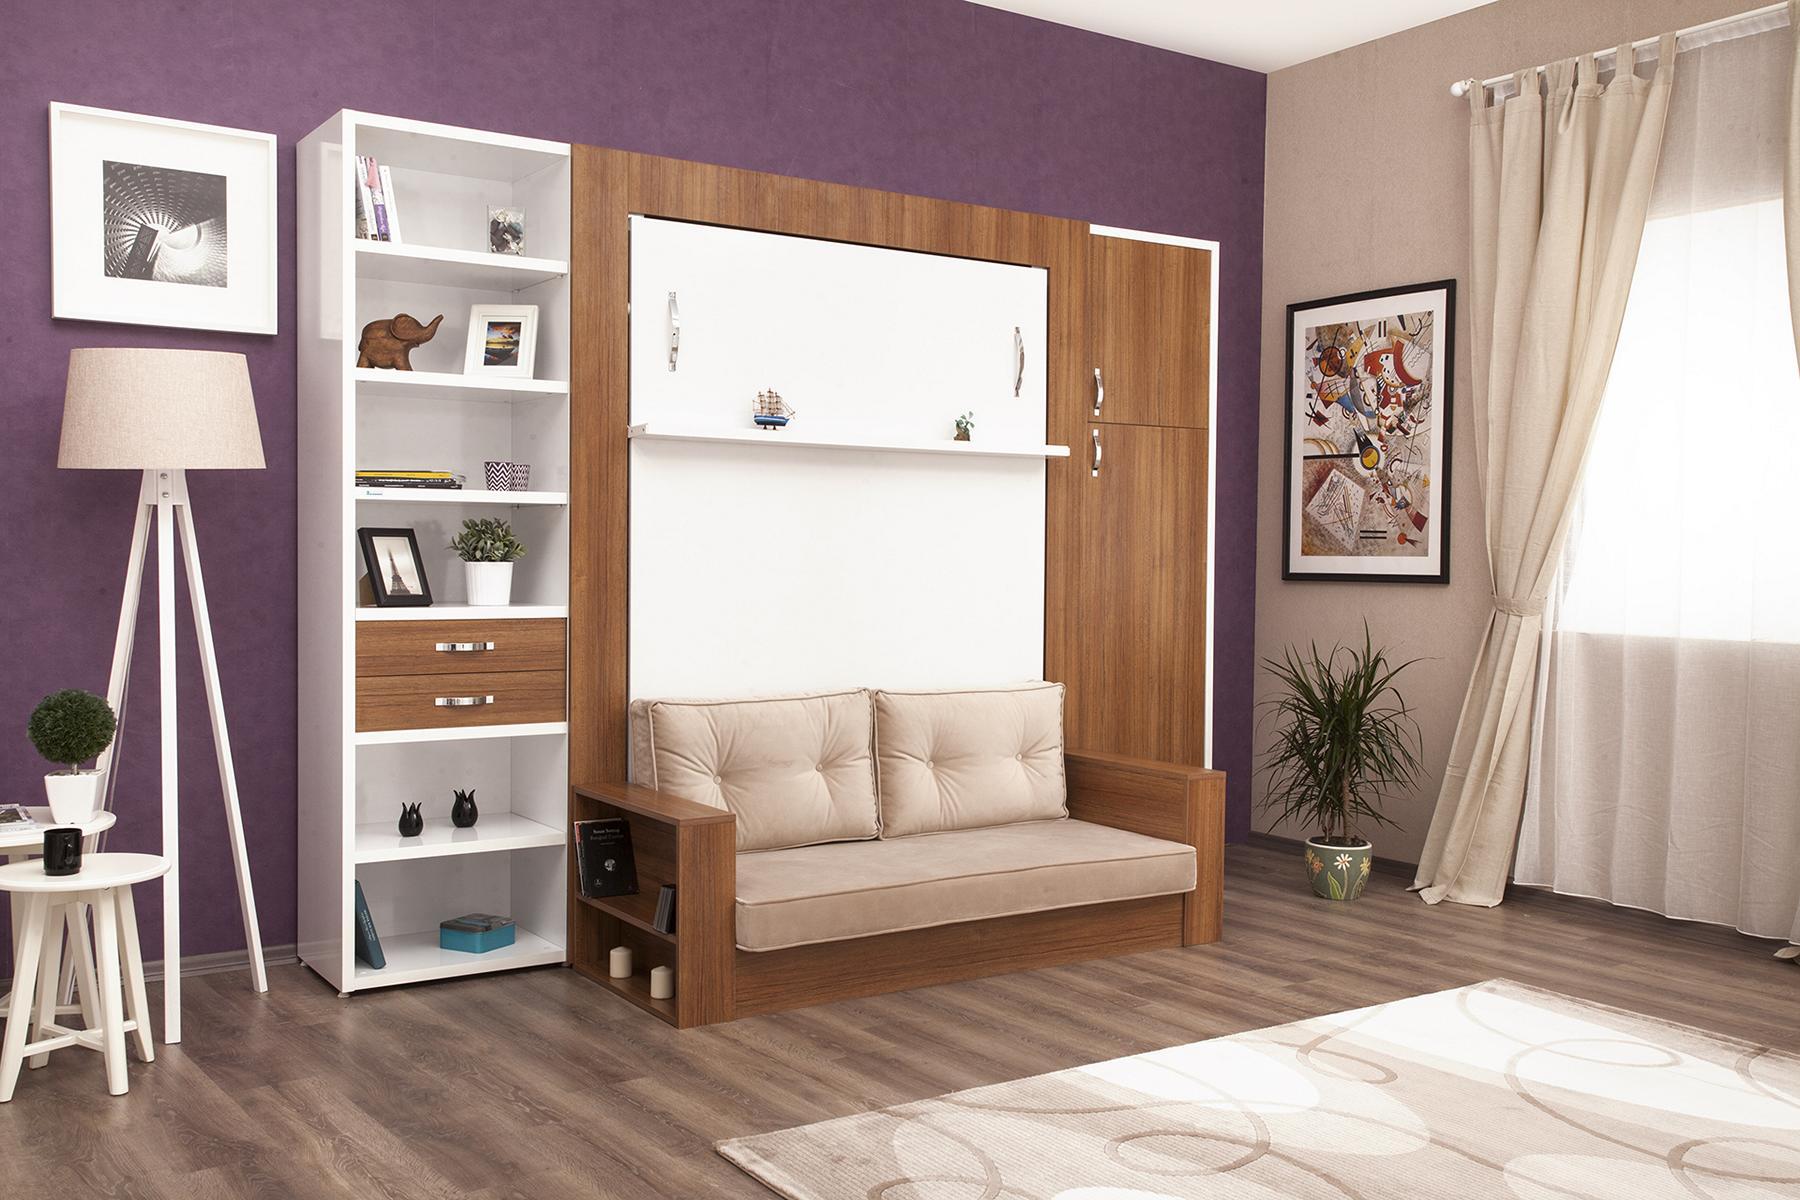 Multimo Multifunktion-Schlafzimmer Set Nova Plus